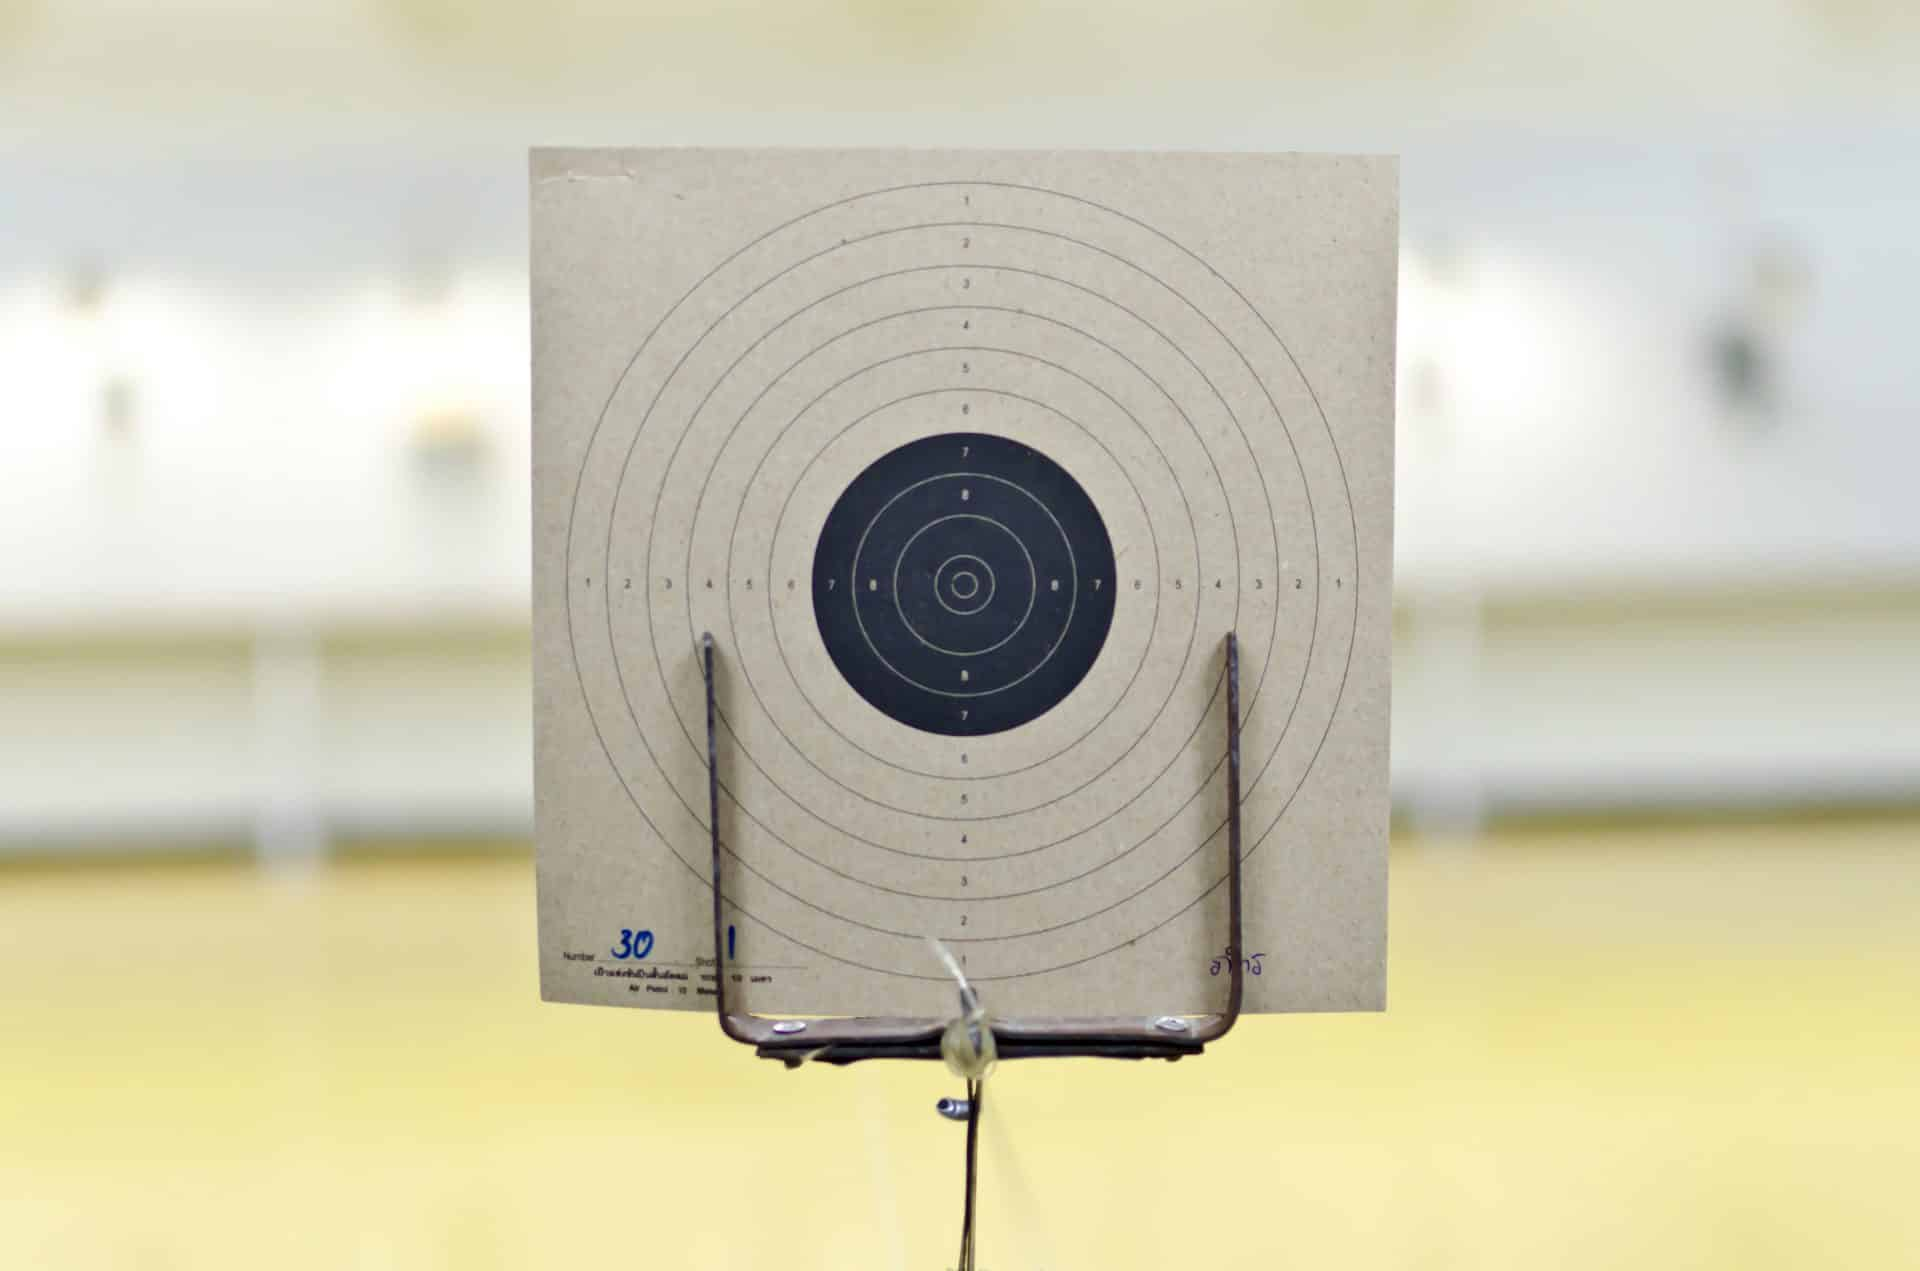 Handgun Training on the Cheap